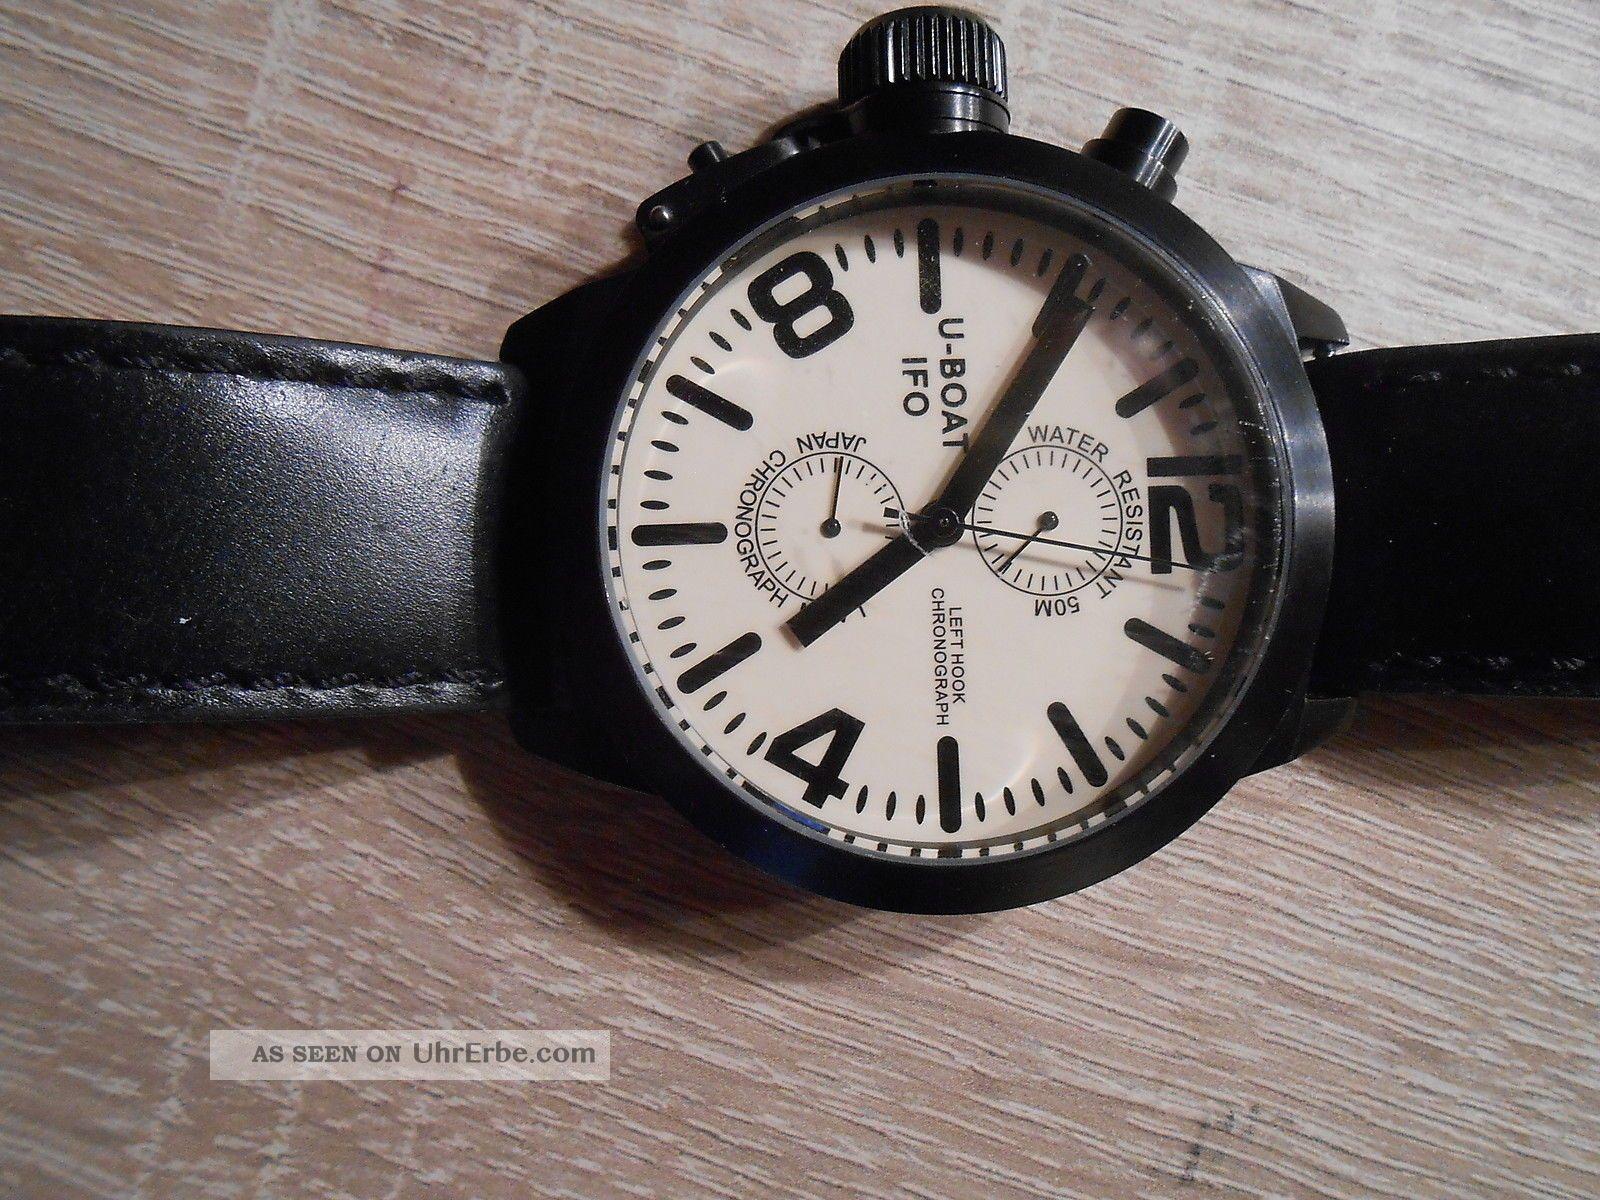 U - Boat Ifo Left Hook Chronograph A48 - Bk - C Italo Fontana Special Edition Nr.  250 Armbanduhren Bild